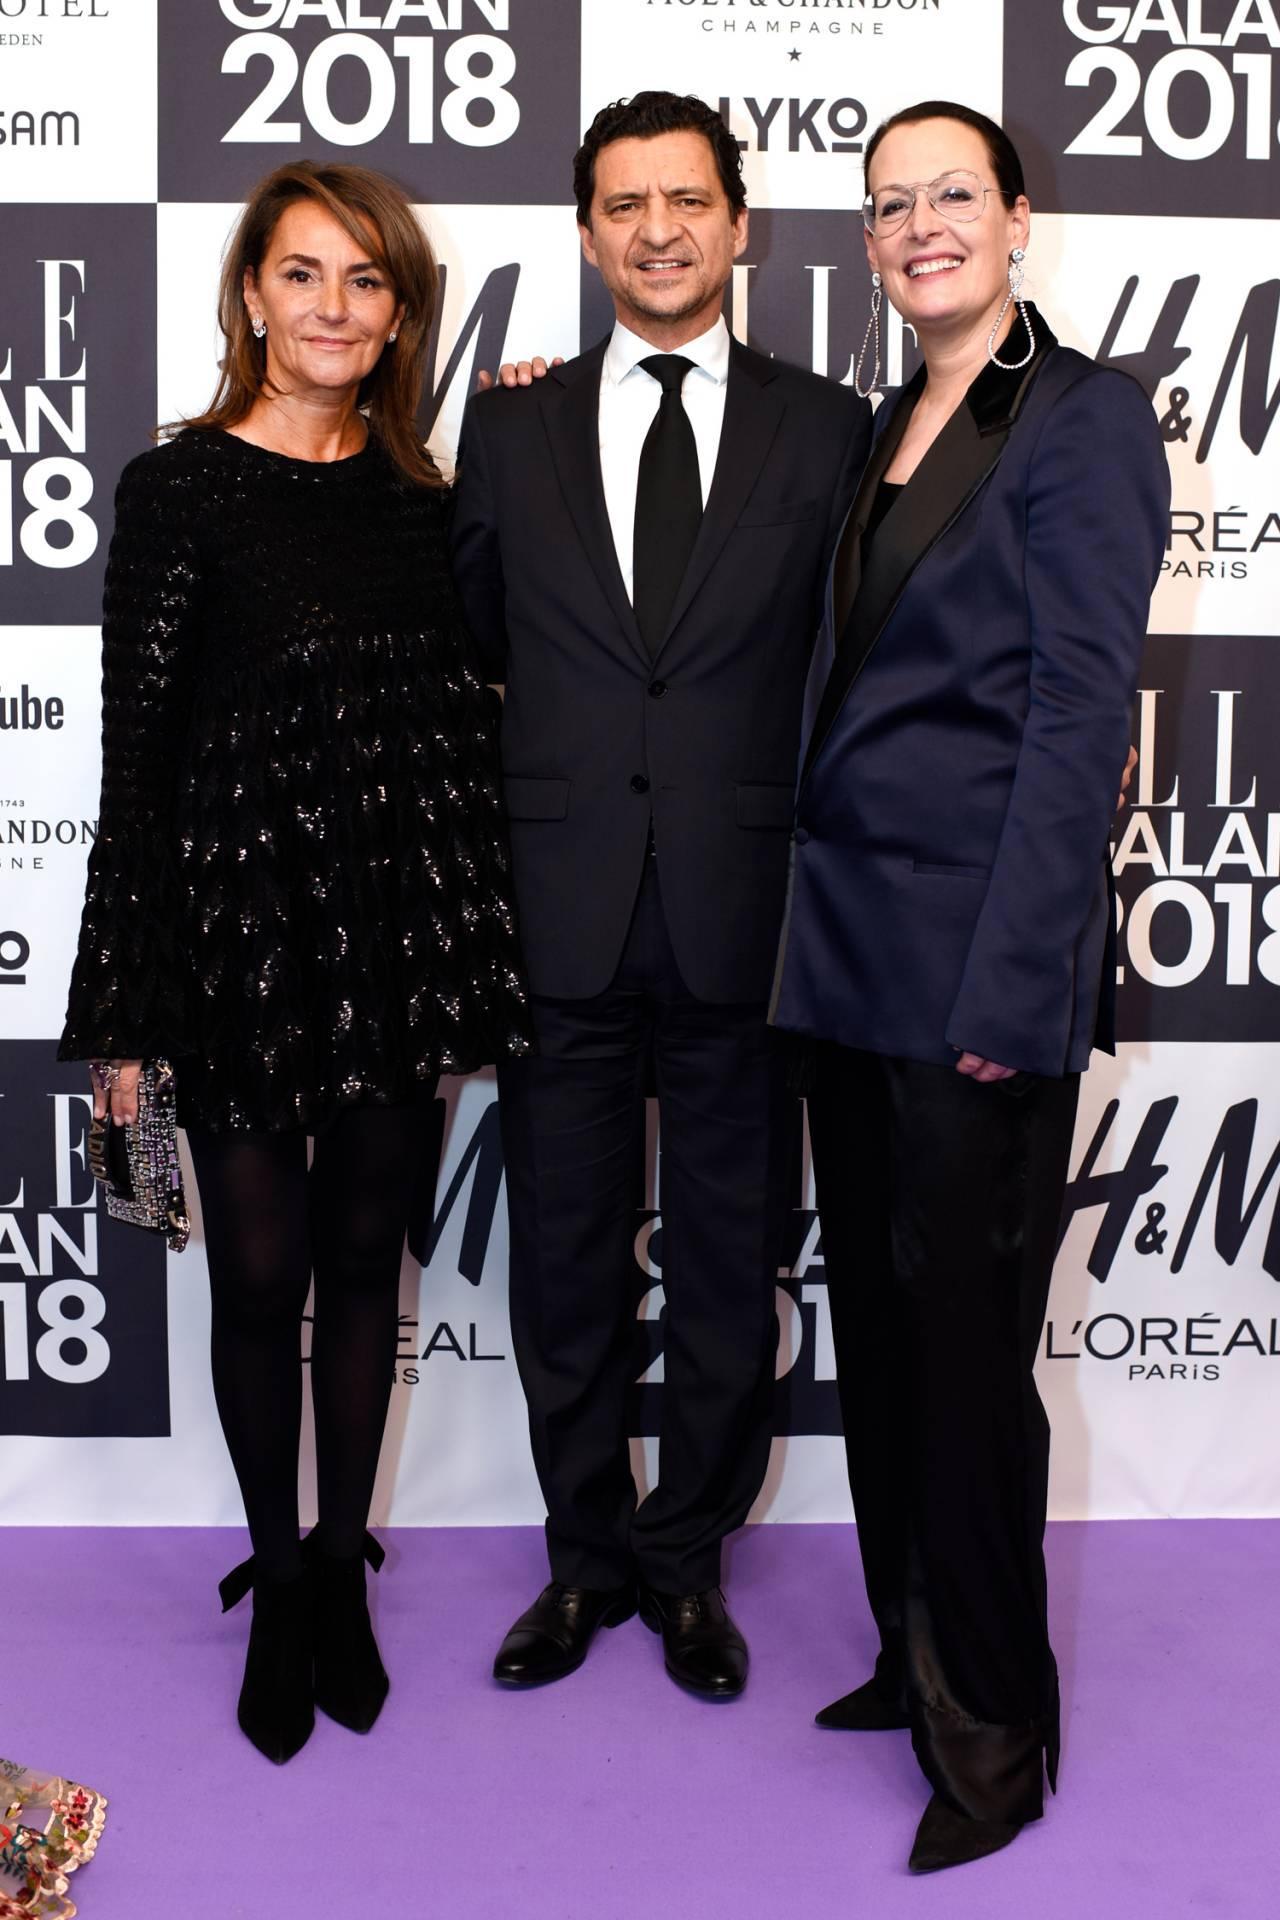 Constance Benqué, François Coruzzi och Cia Jansson